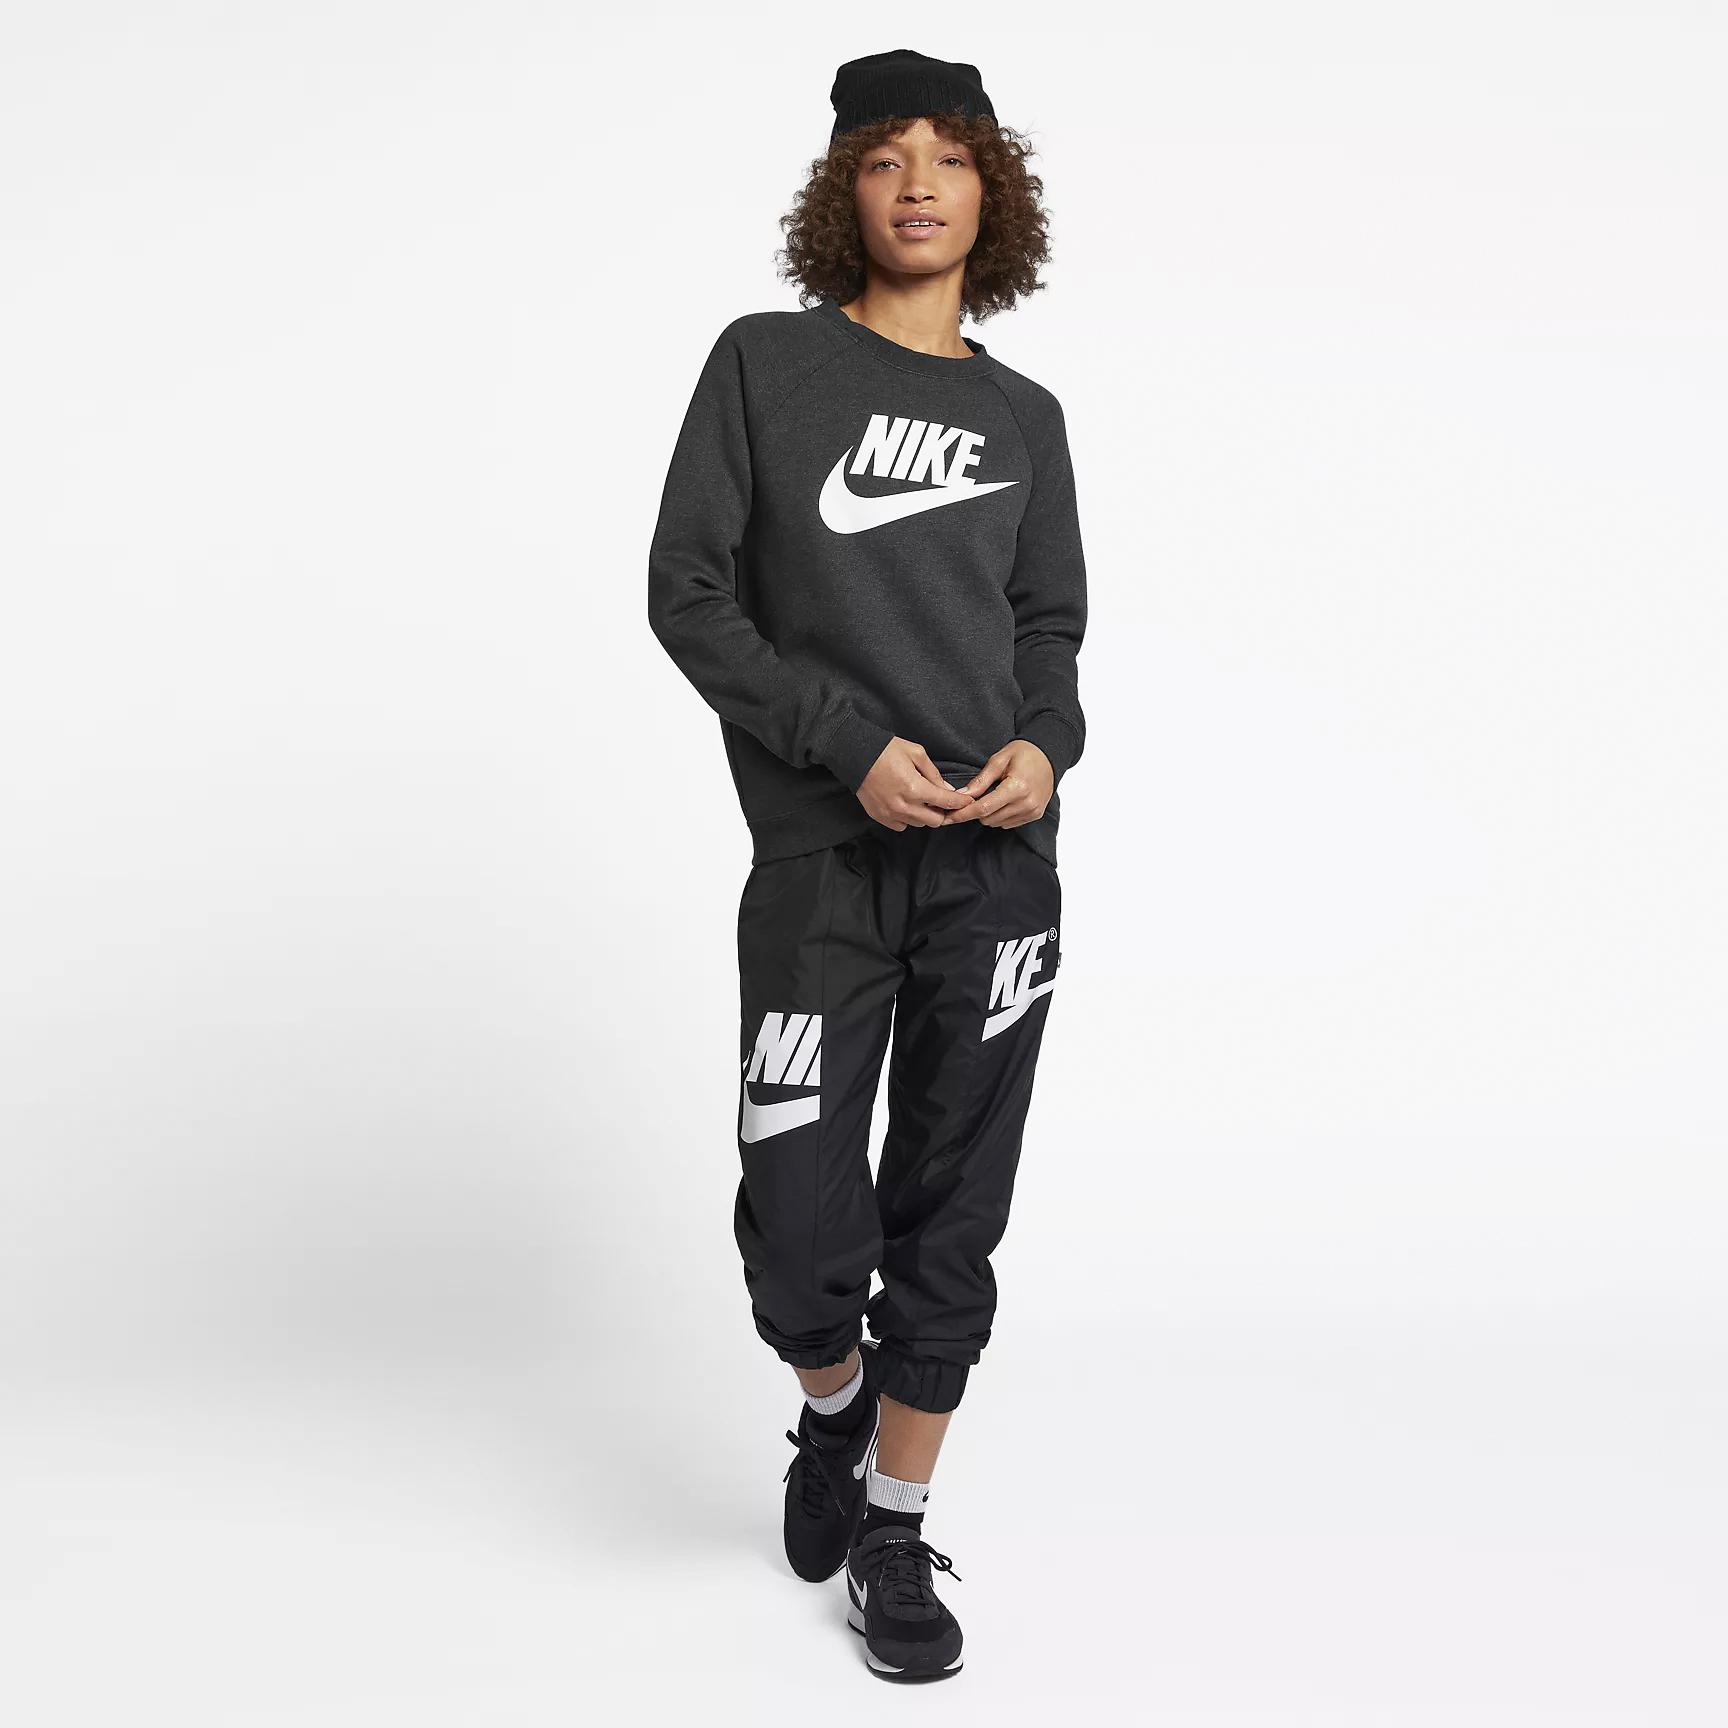 NikeFall18_040.jpg